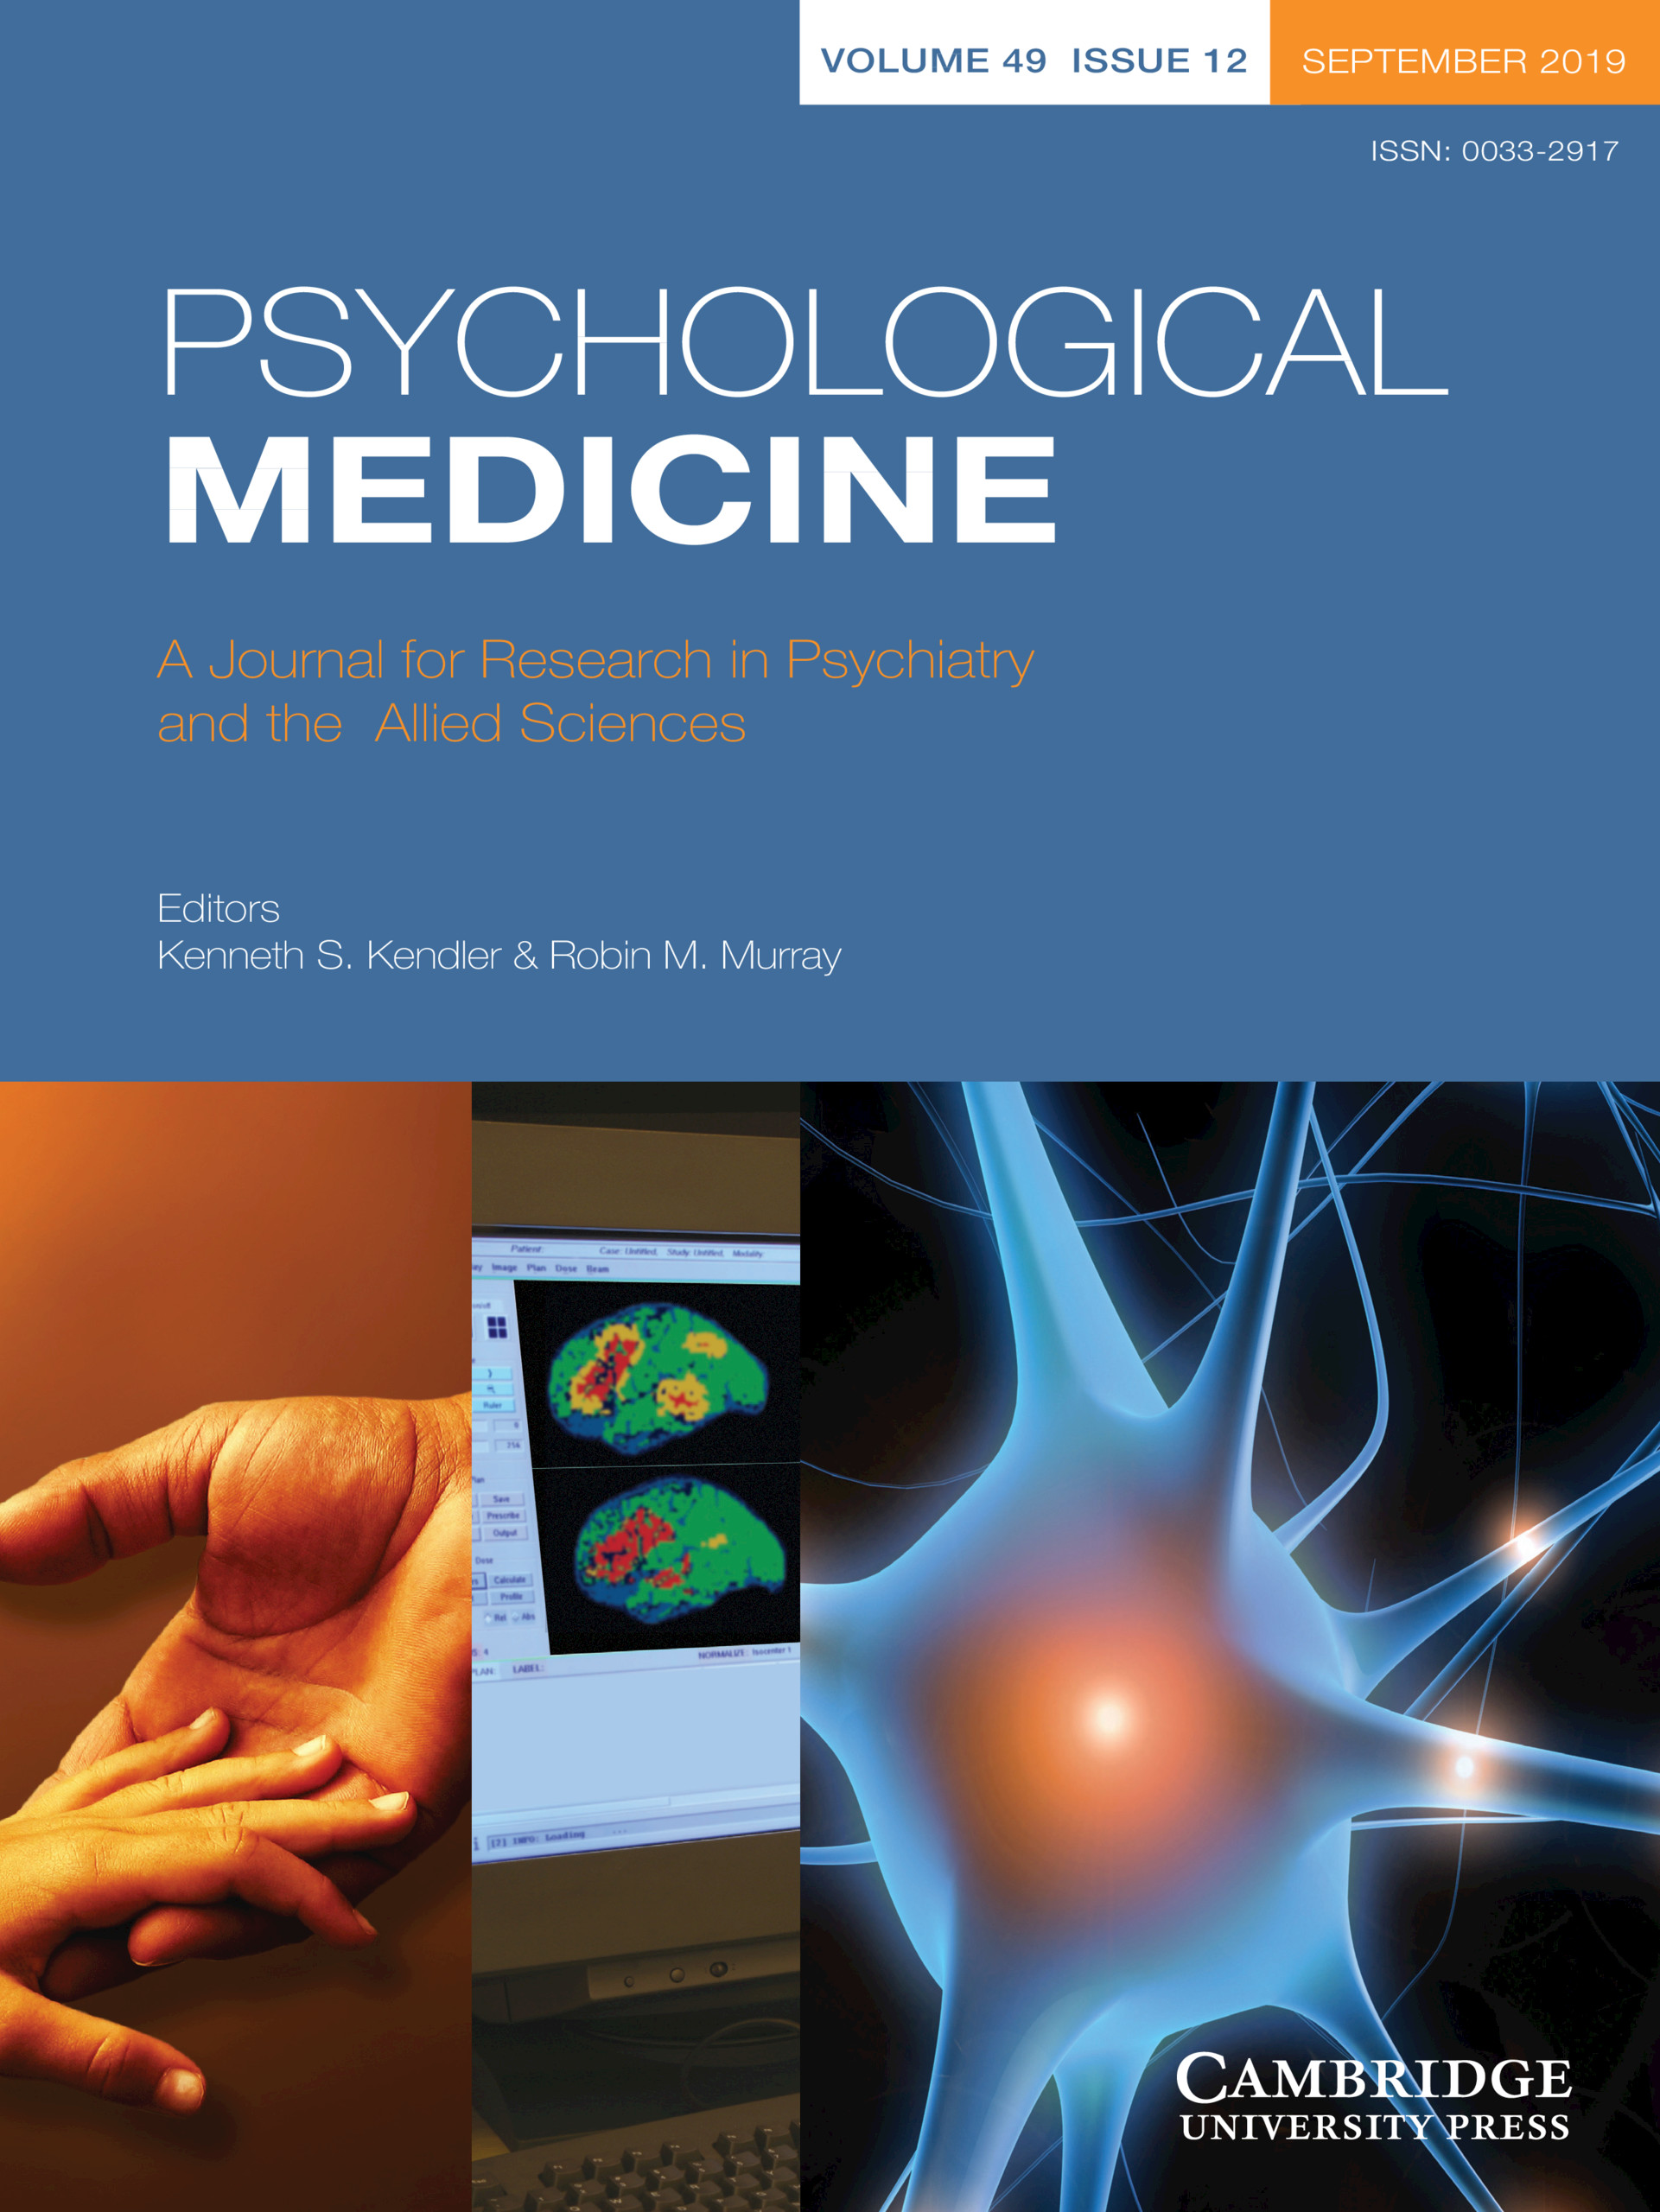 Psychological Medicine   Latest issue   Cambridge Core